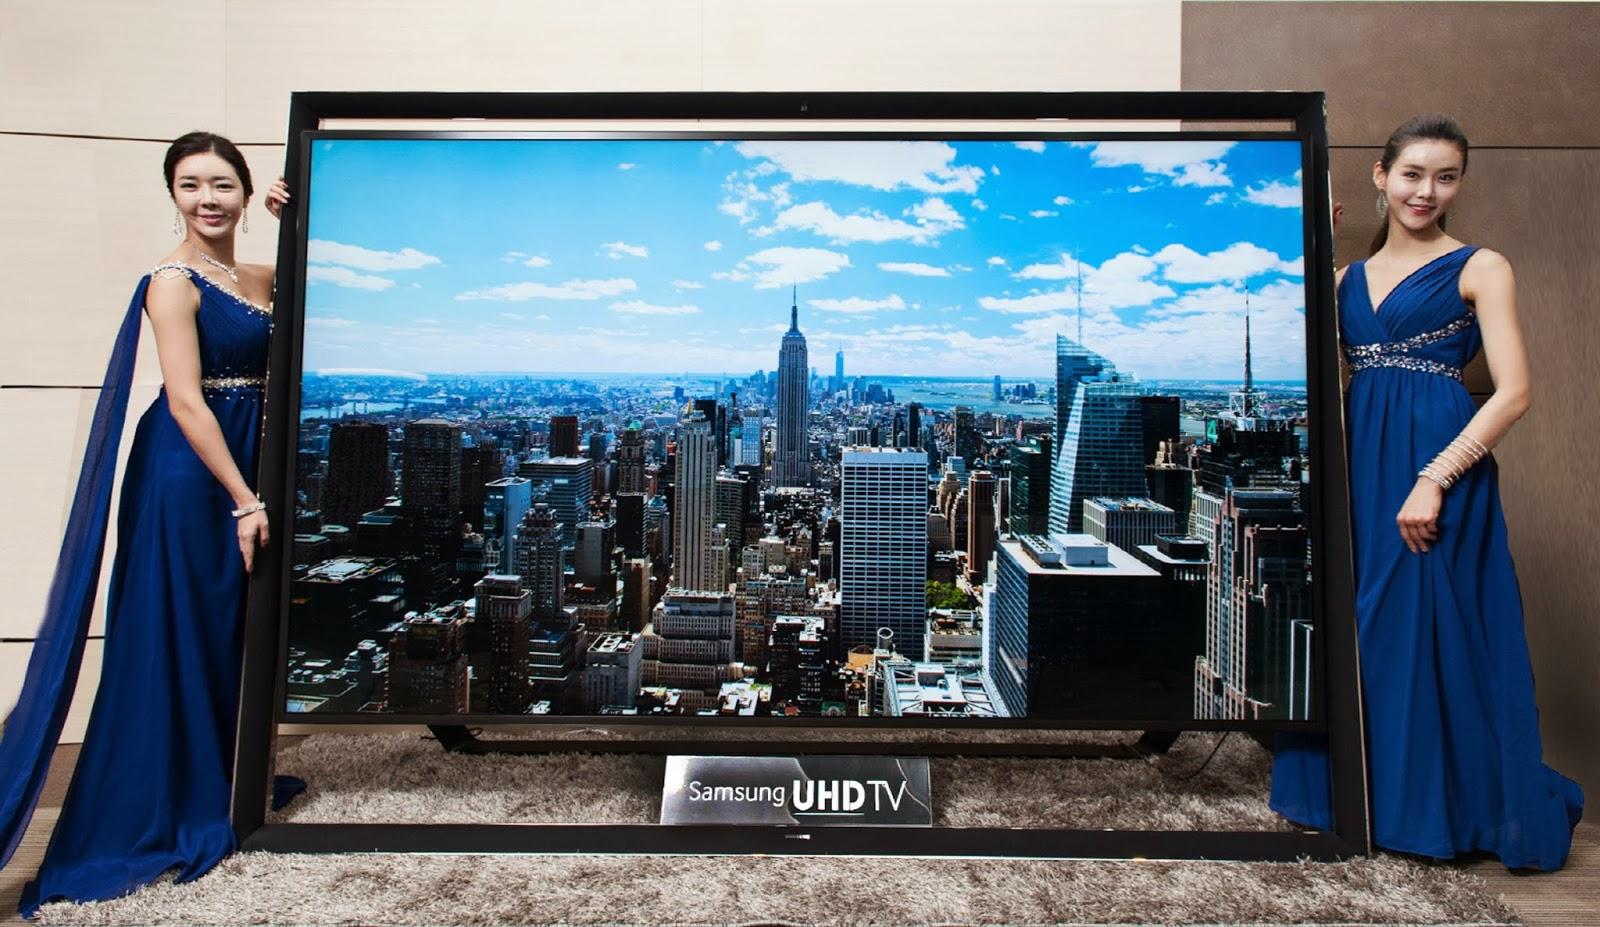 $152000, Electronics, full-HD, Largest, Model, Samsung, Seoul, South Korea, Technology, Television, TV, UHD, Ultra HD, Ultra-high definition, USD,